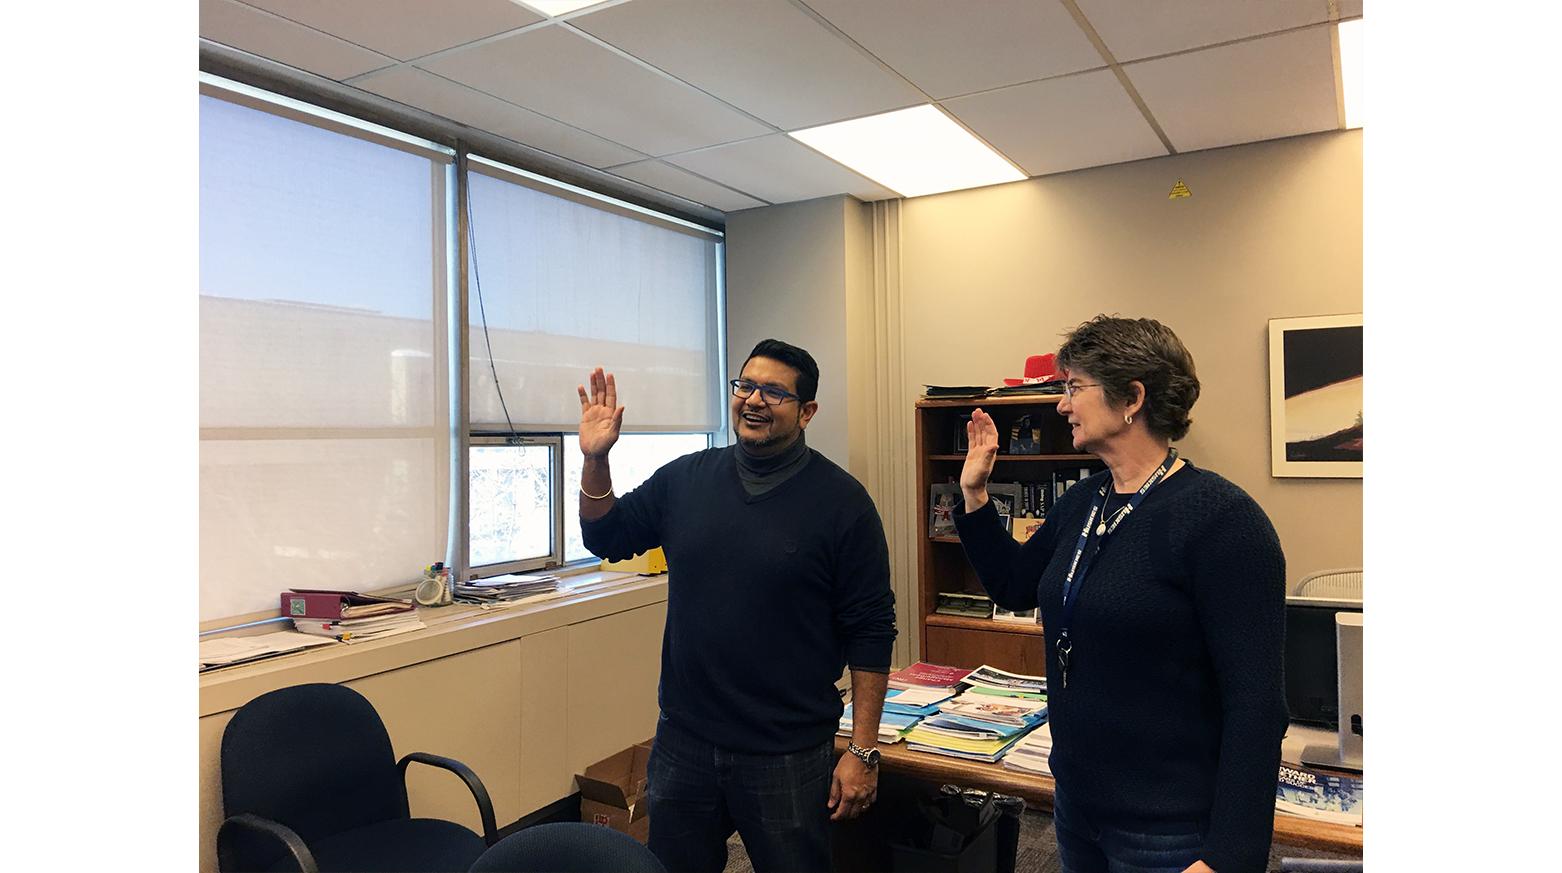 Darshan Harrinanan gets sworn in